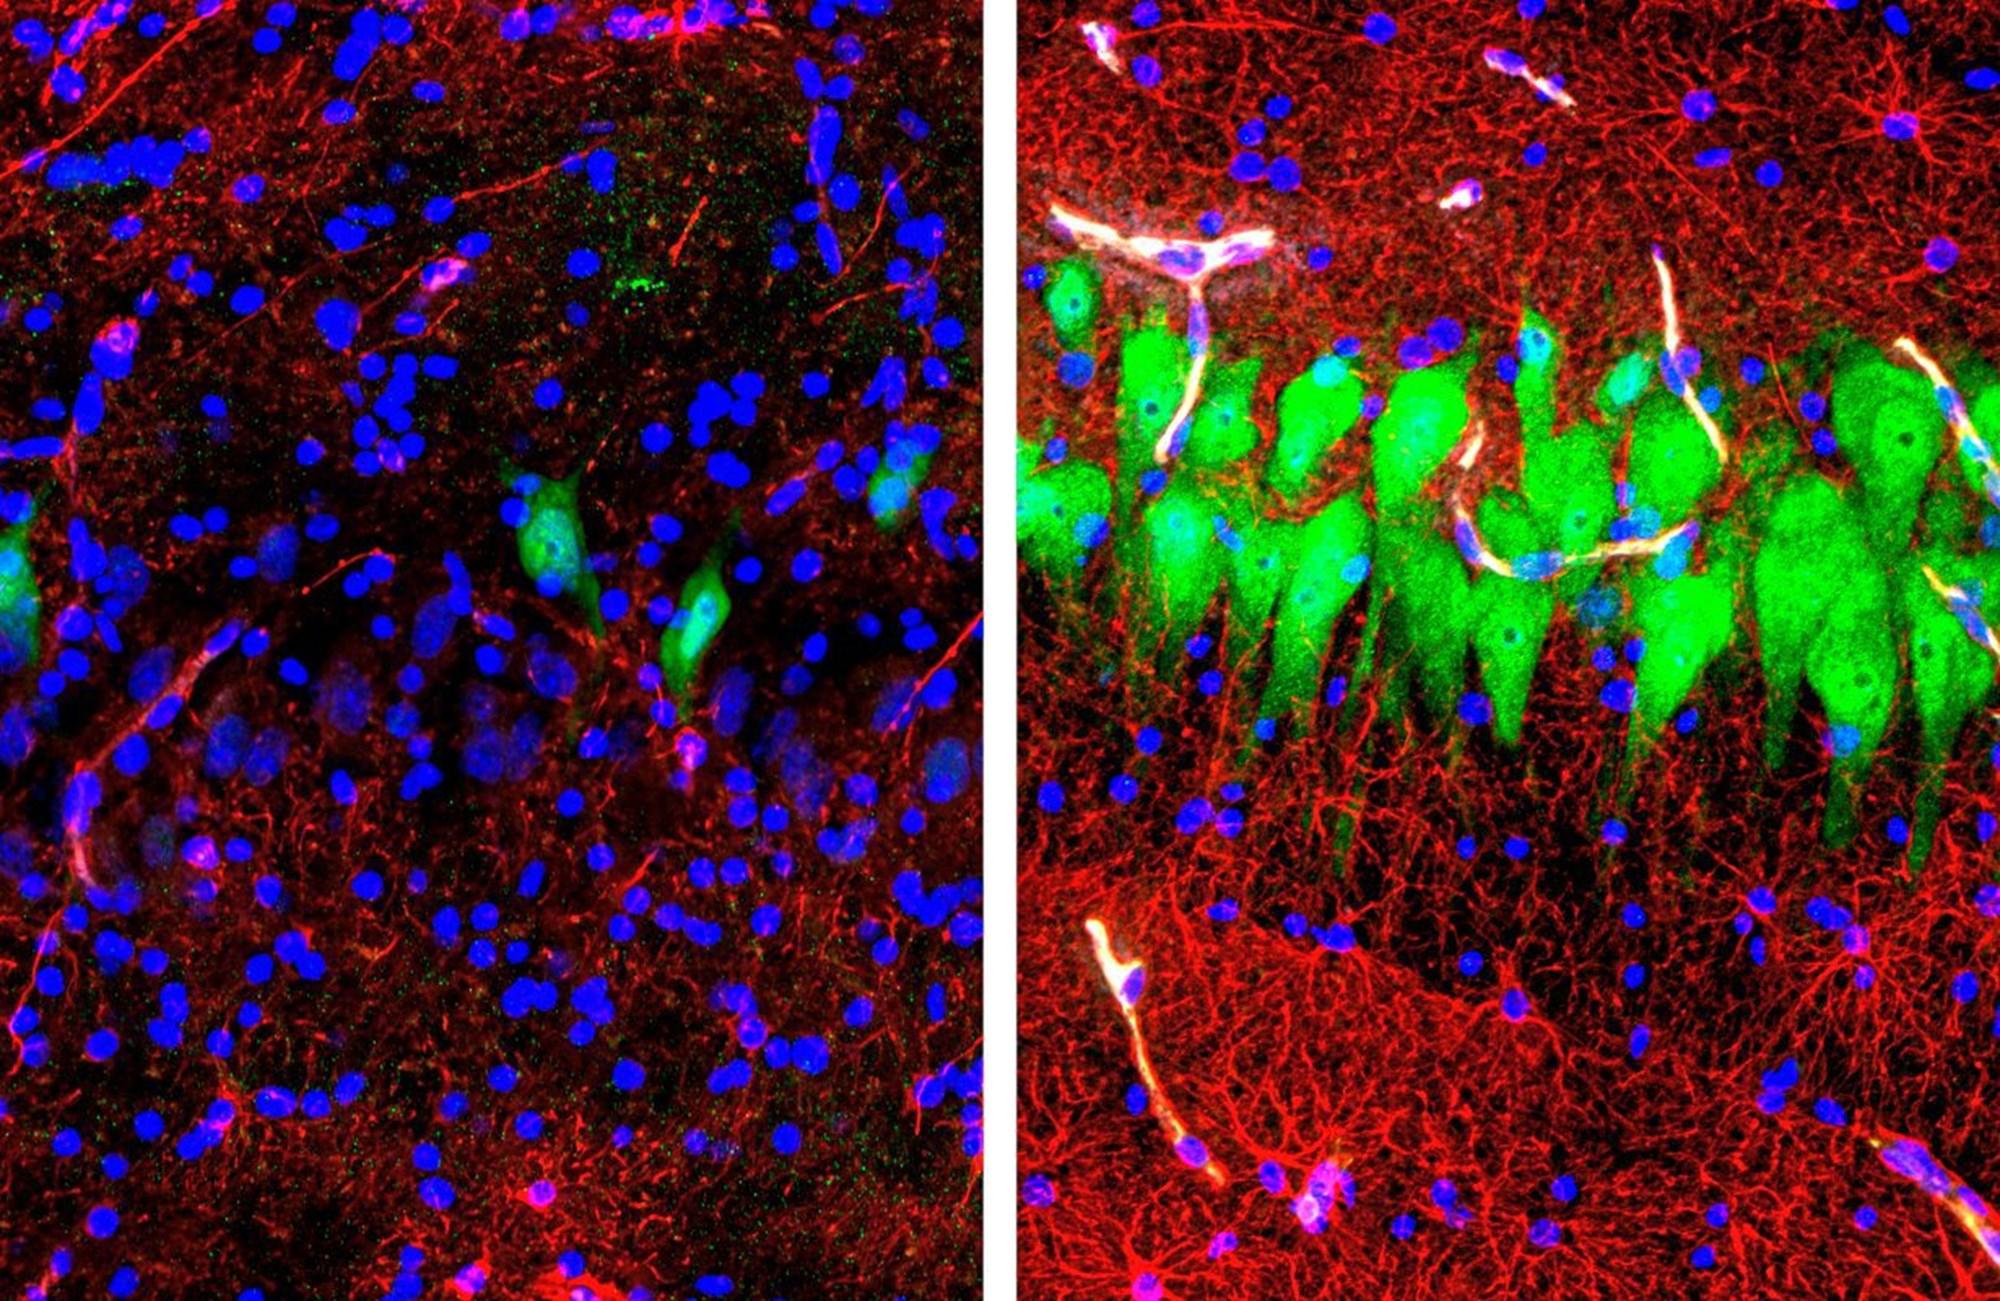 Hirnzellen Stunden nach dem Tod wieder aktiviert – derStandard.at